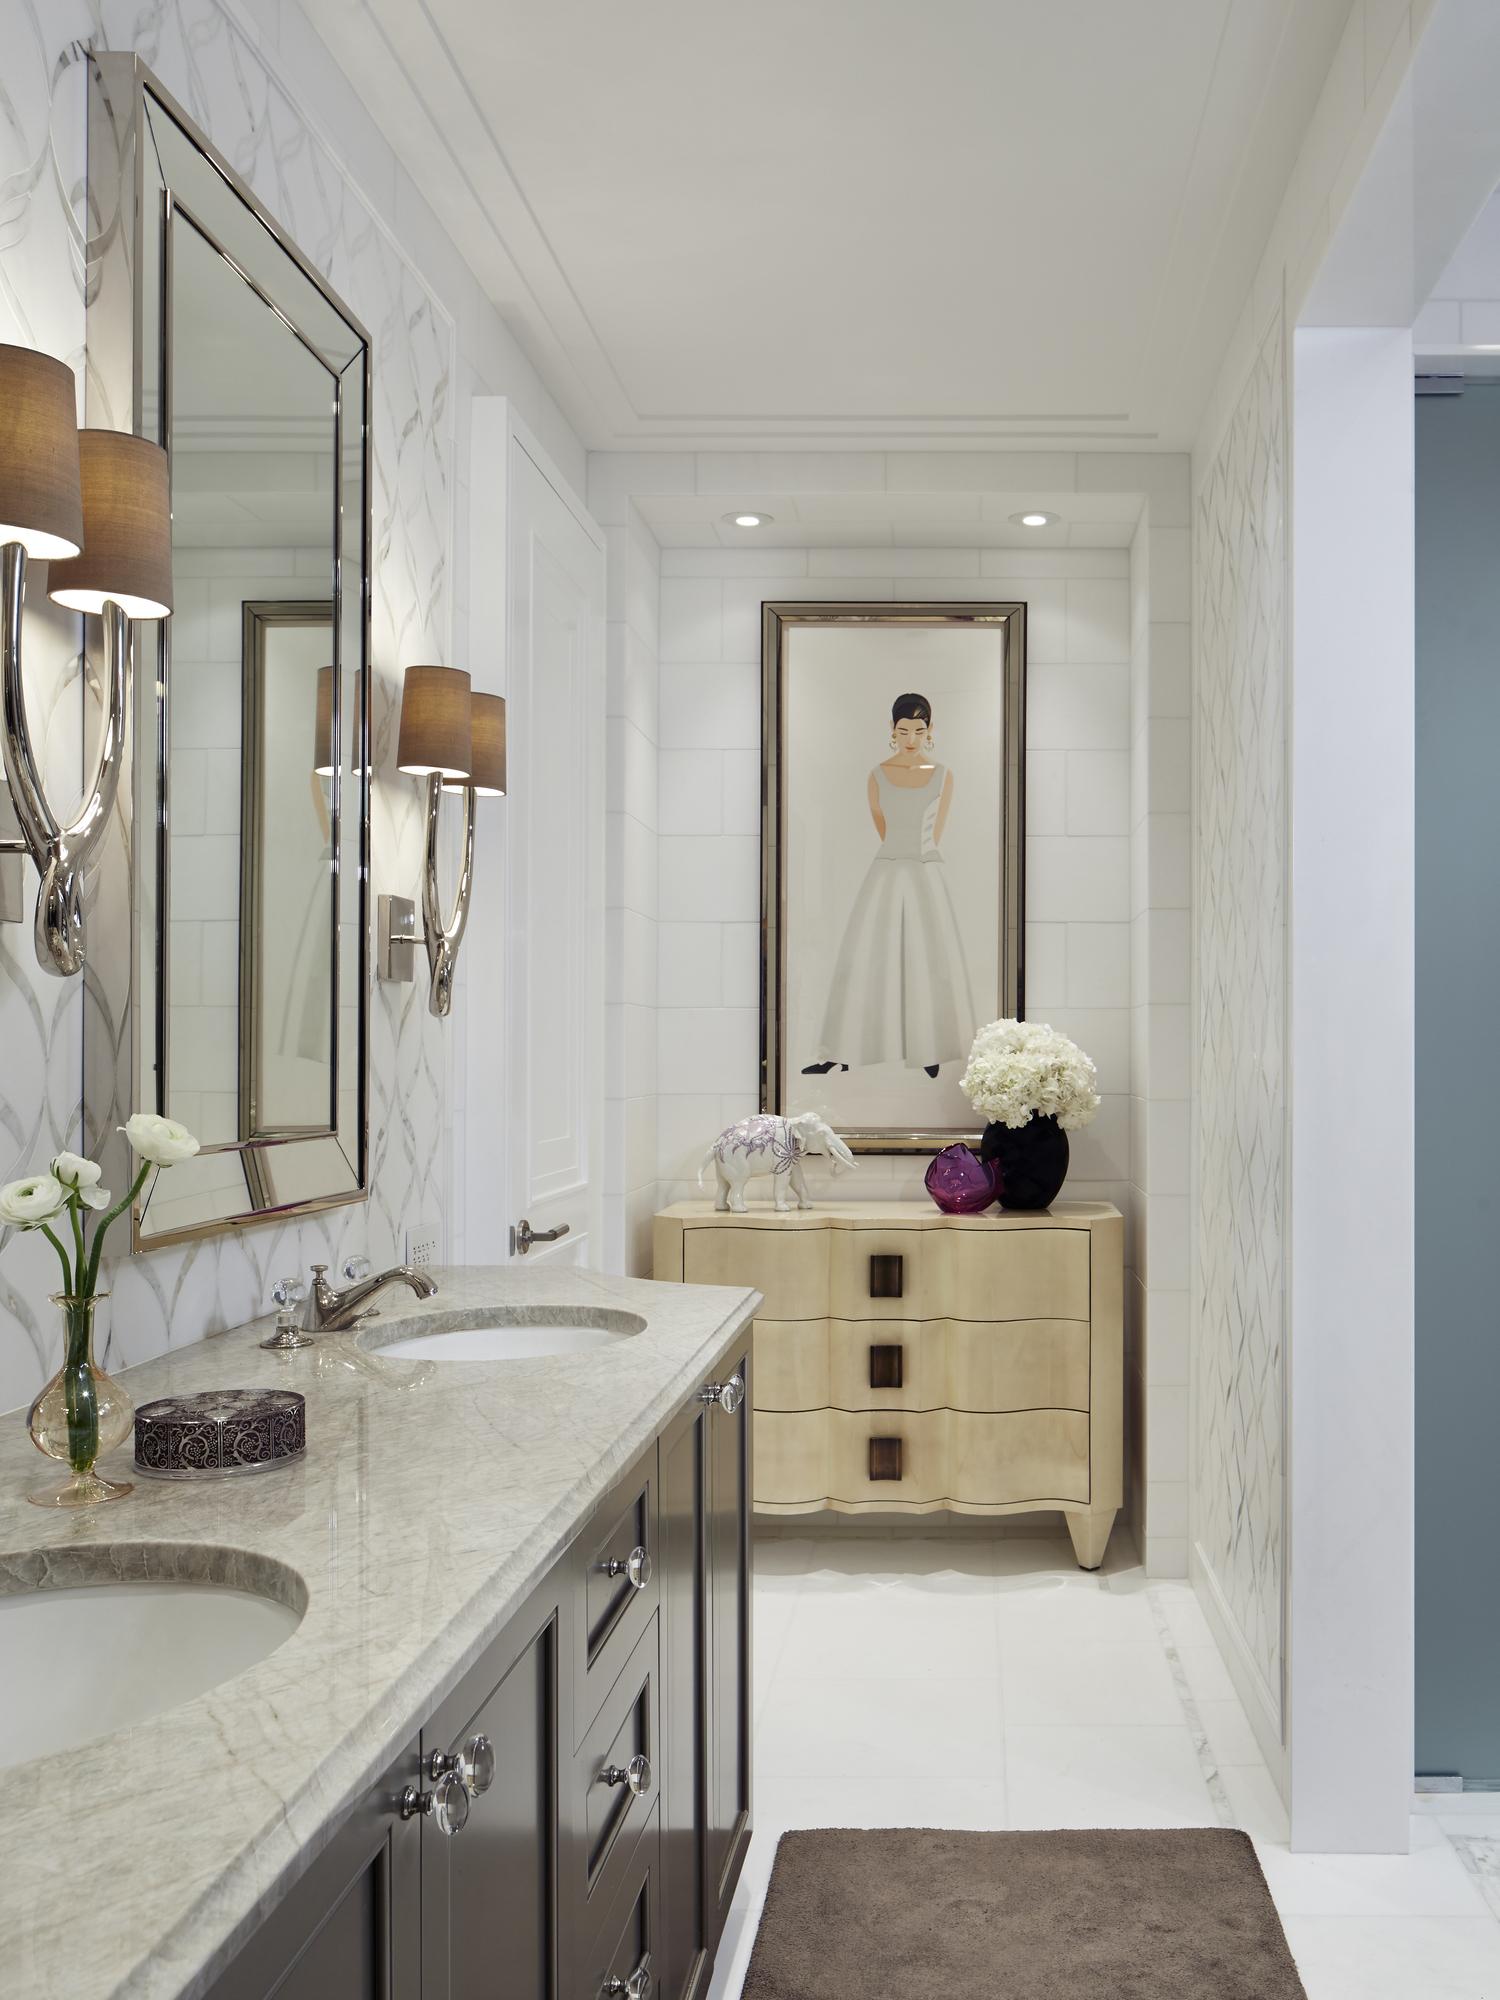 MASTER BATHROOM RENOVATION — KADLEC ARCHITECTURE + DESIGN